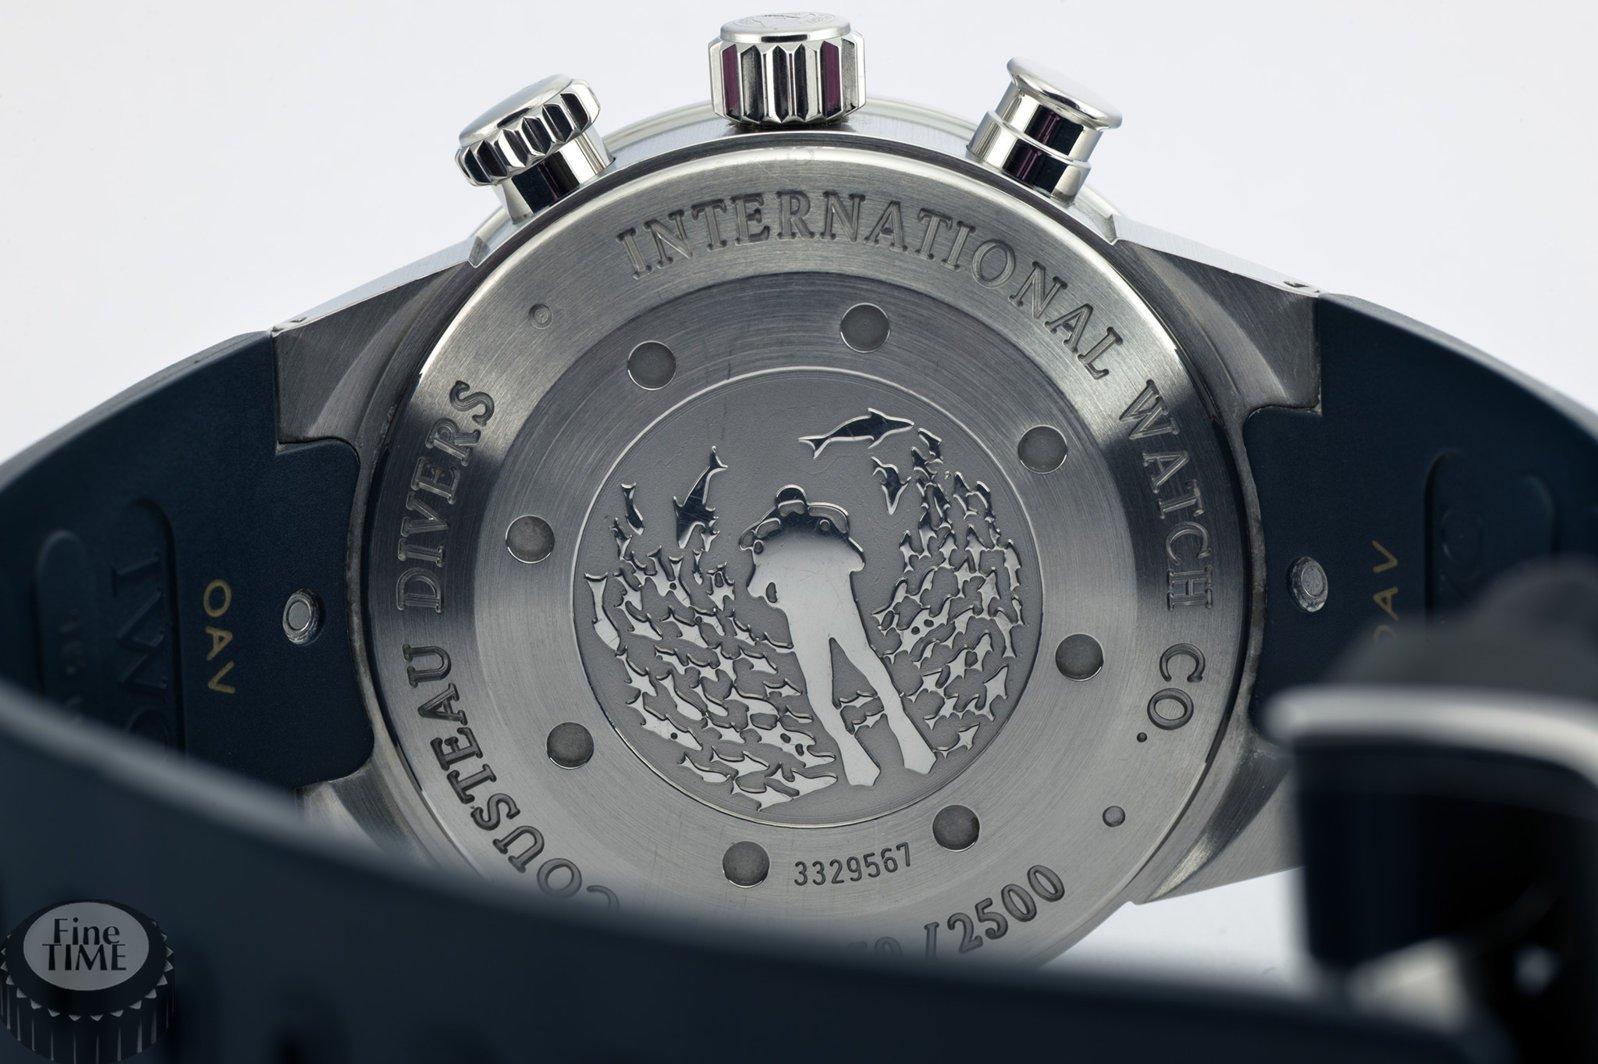 iwc-aquatimer-chronograph-cousteau-divers-iw378101-02.jpg